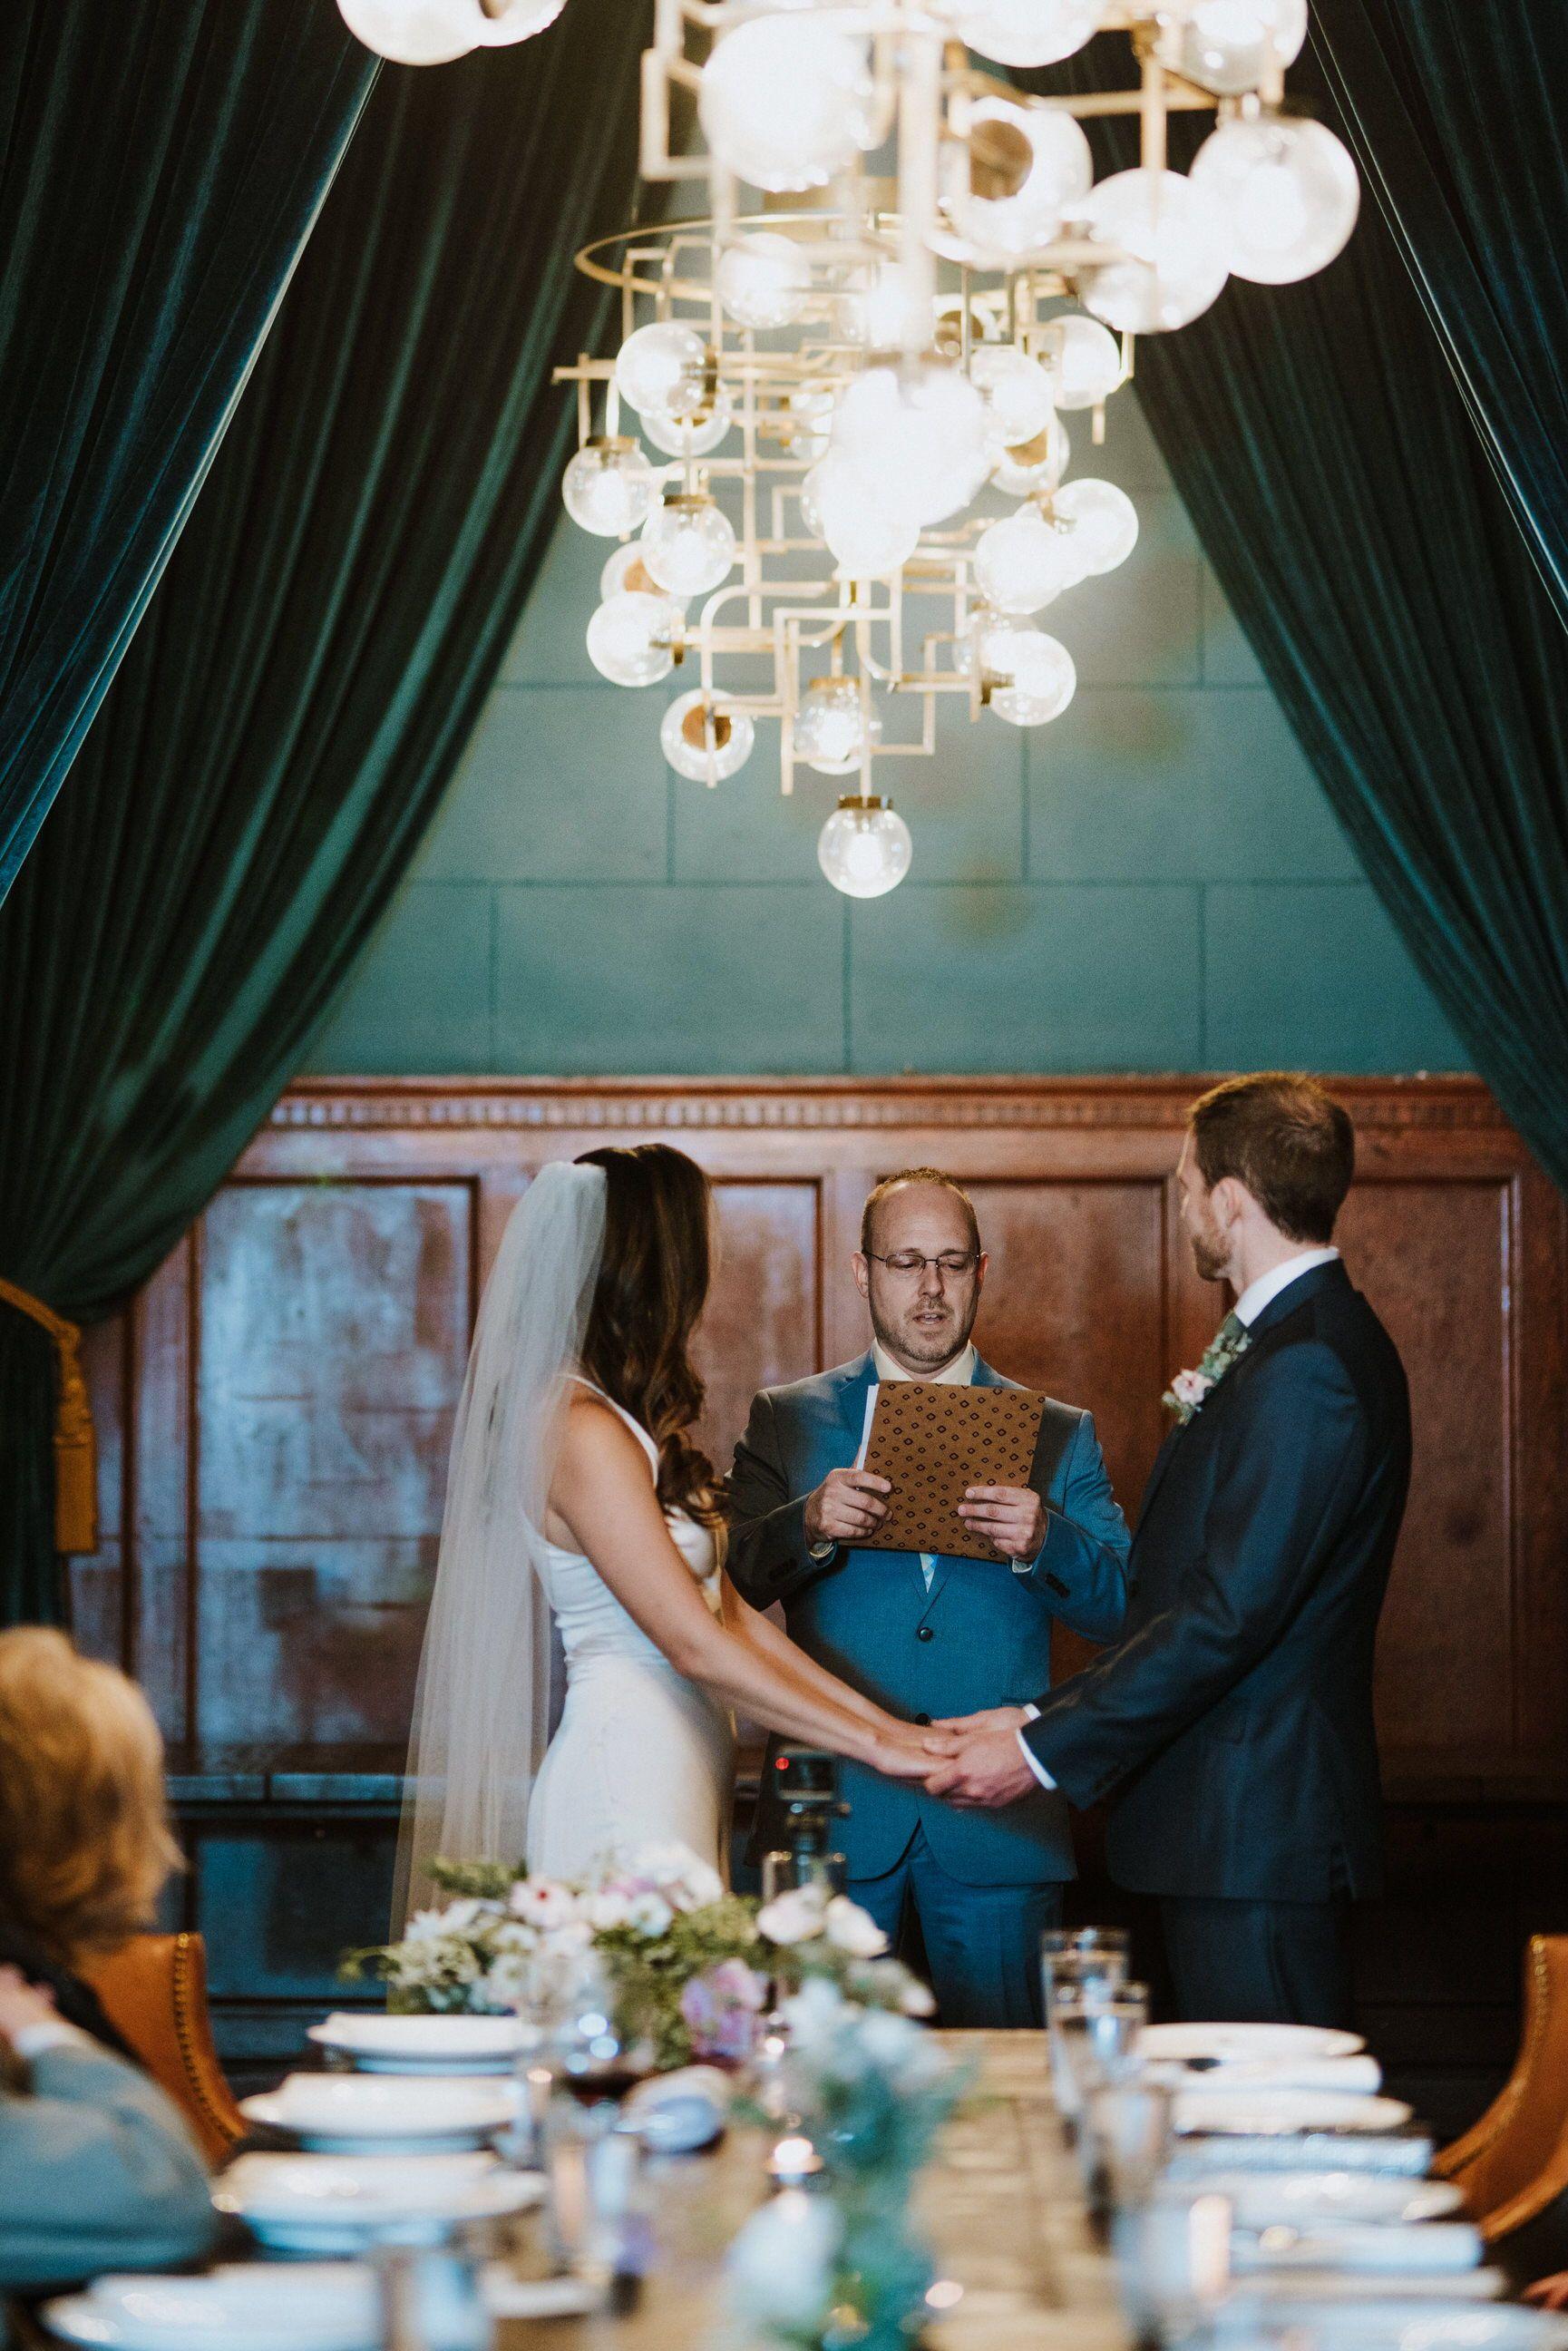 Detroit Foundation Hotel Wedding Small intimate wedding